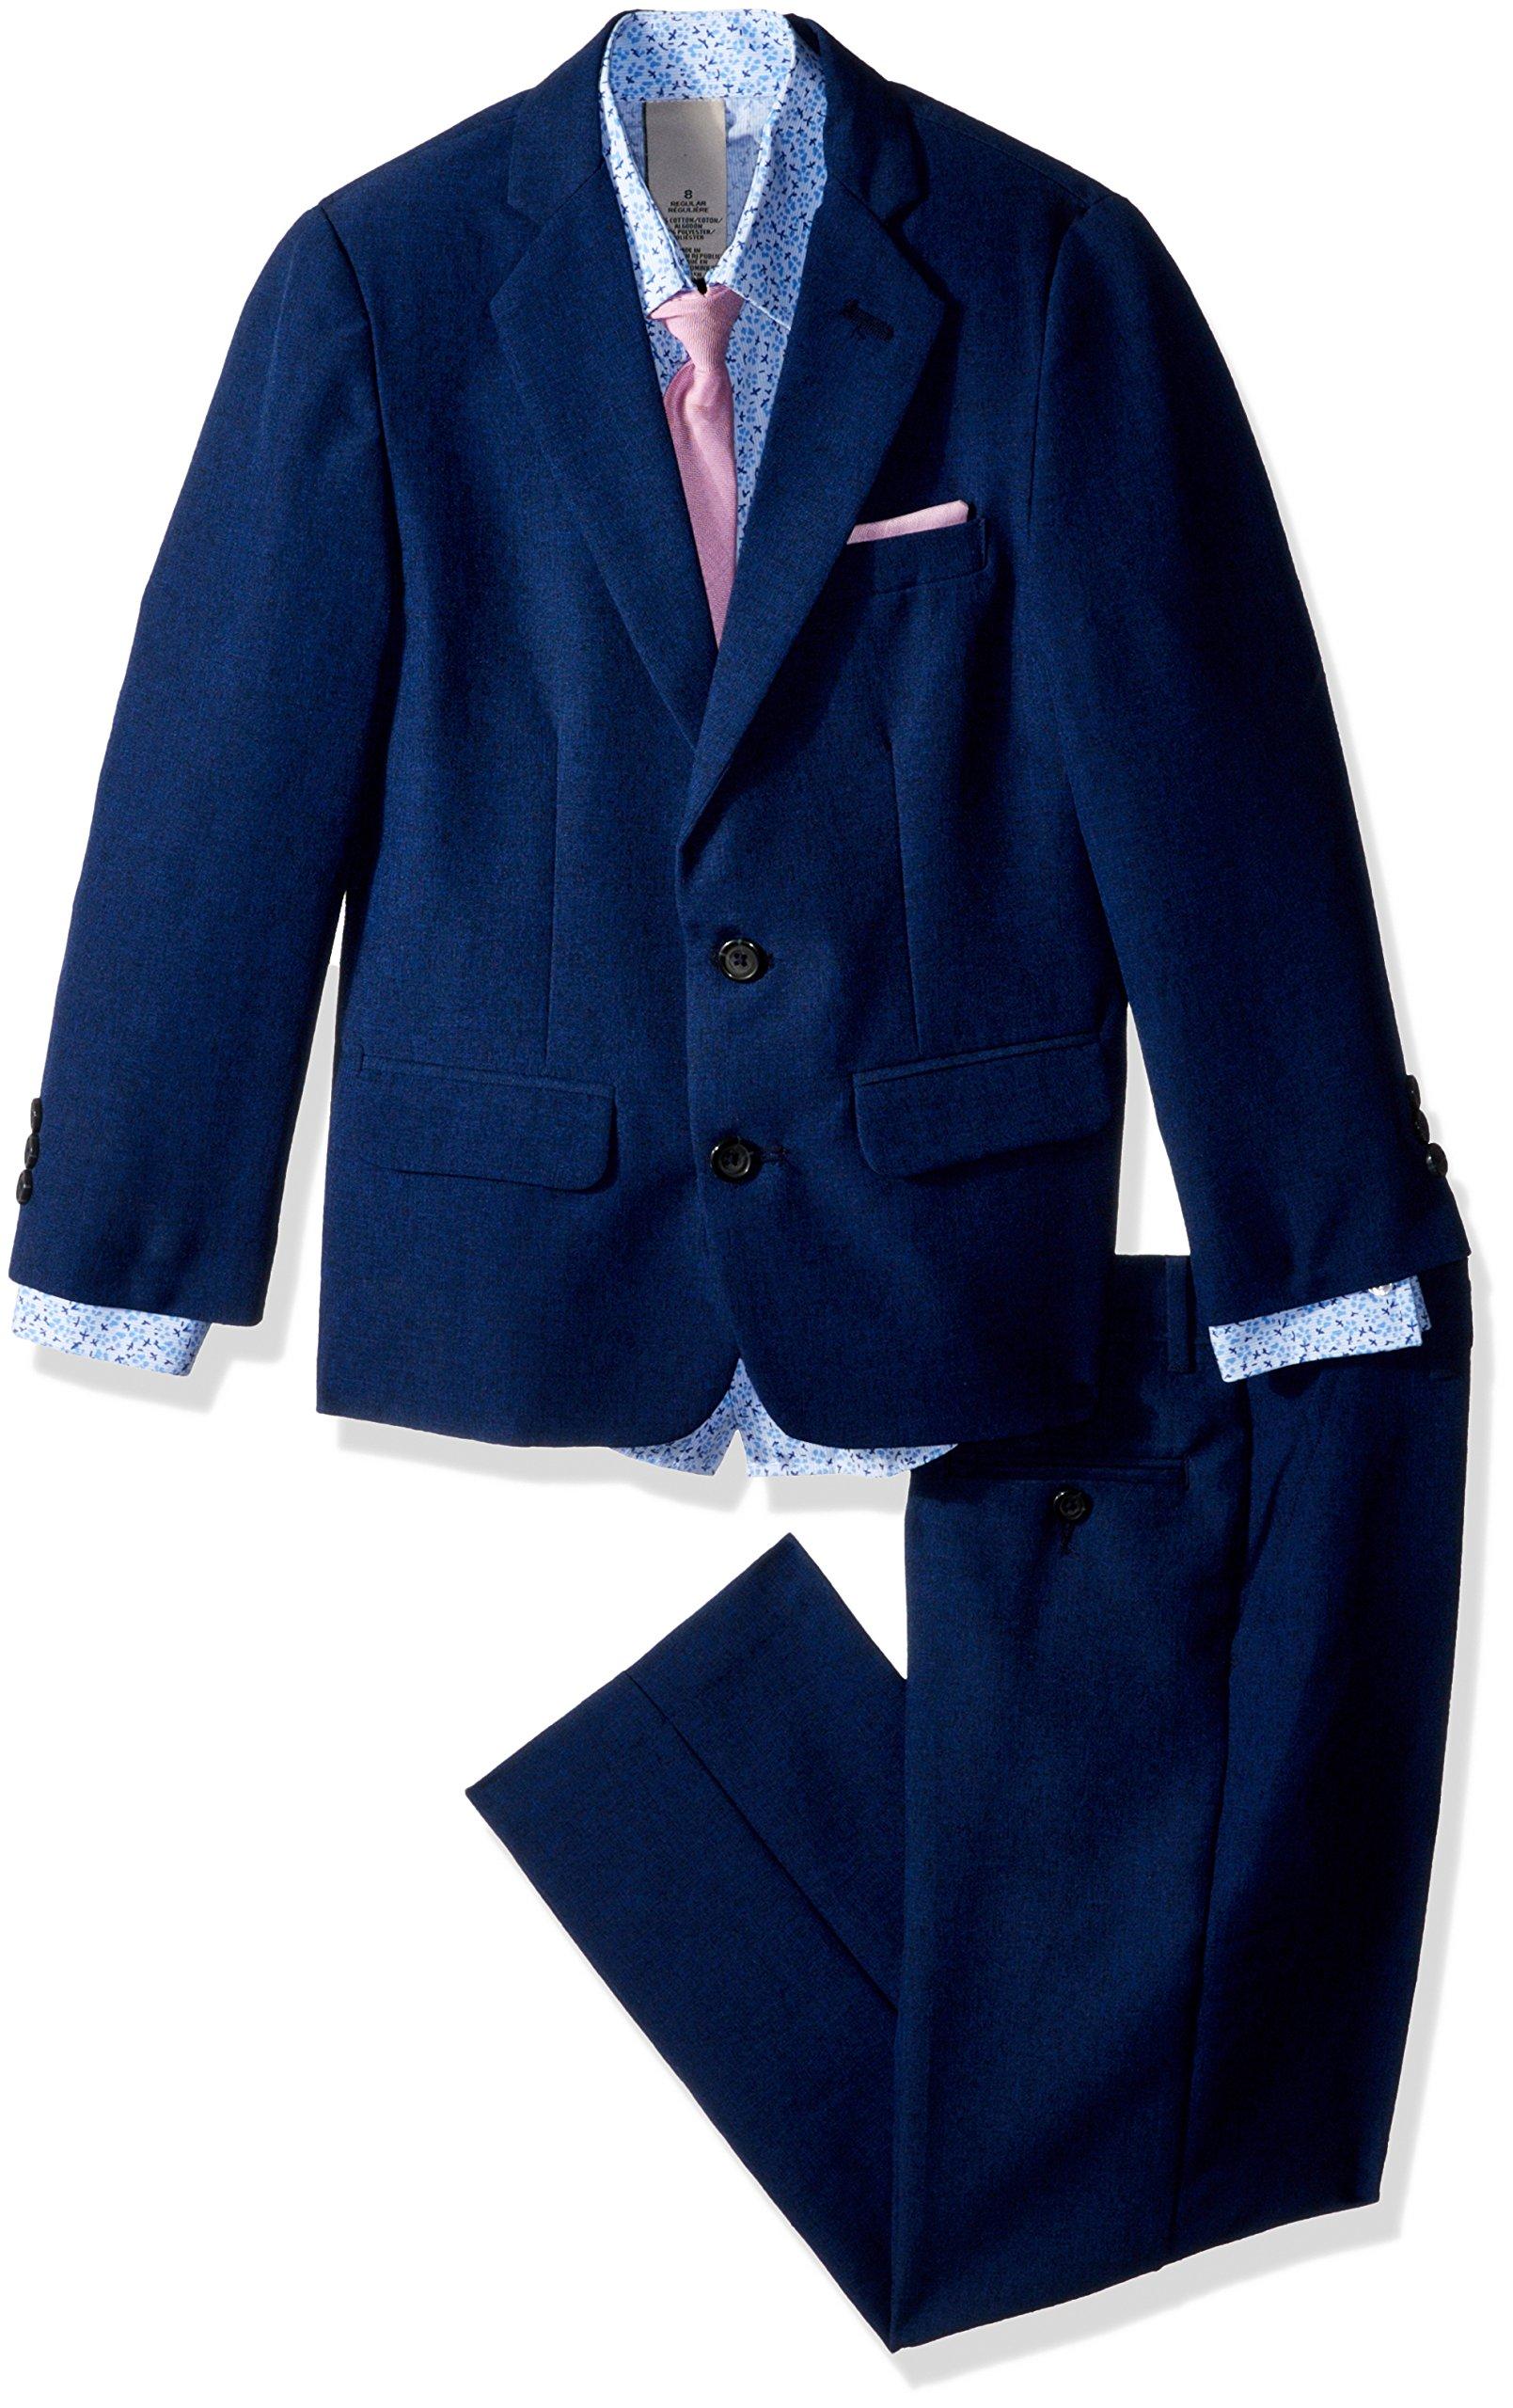 Kenneth Cole Big Boys' Four Piece Suit Set, Heather Academy Blue, 8